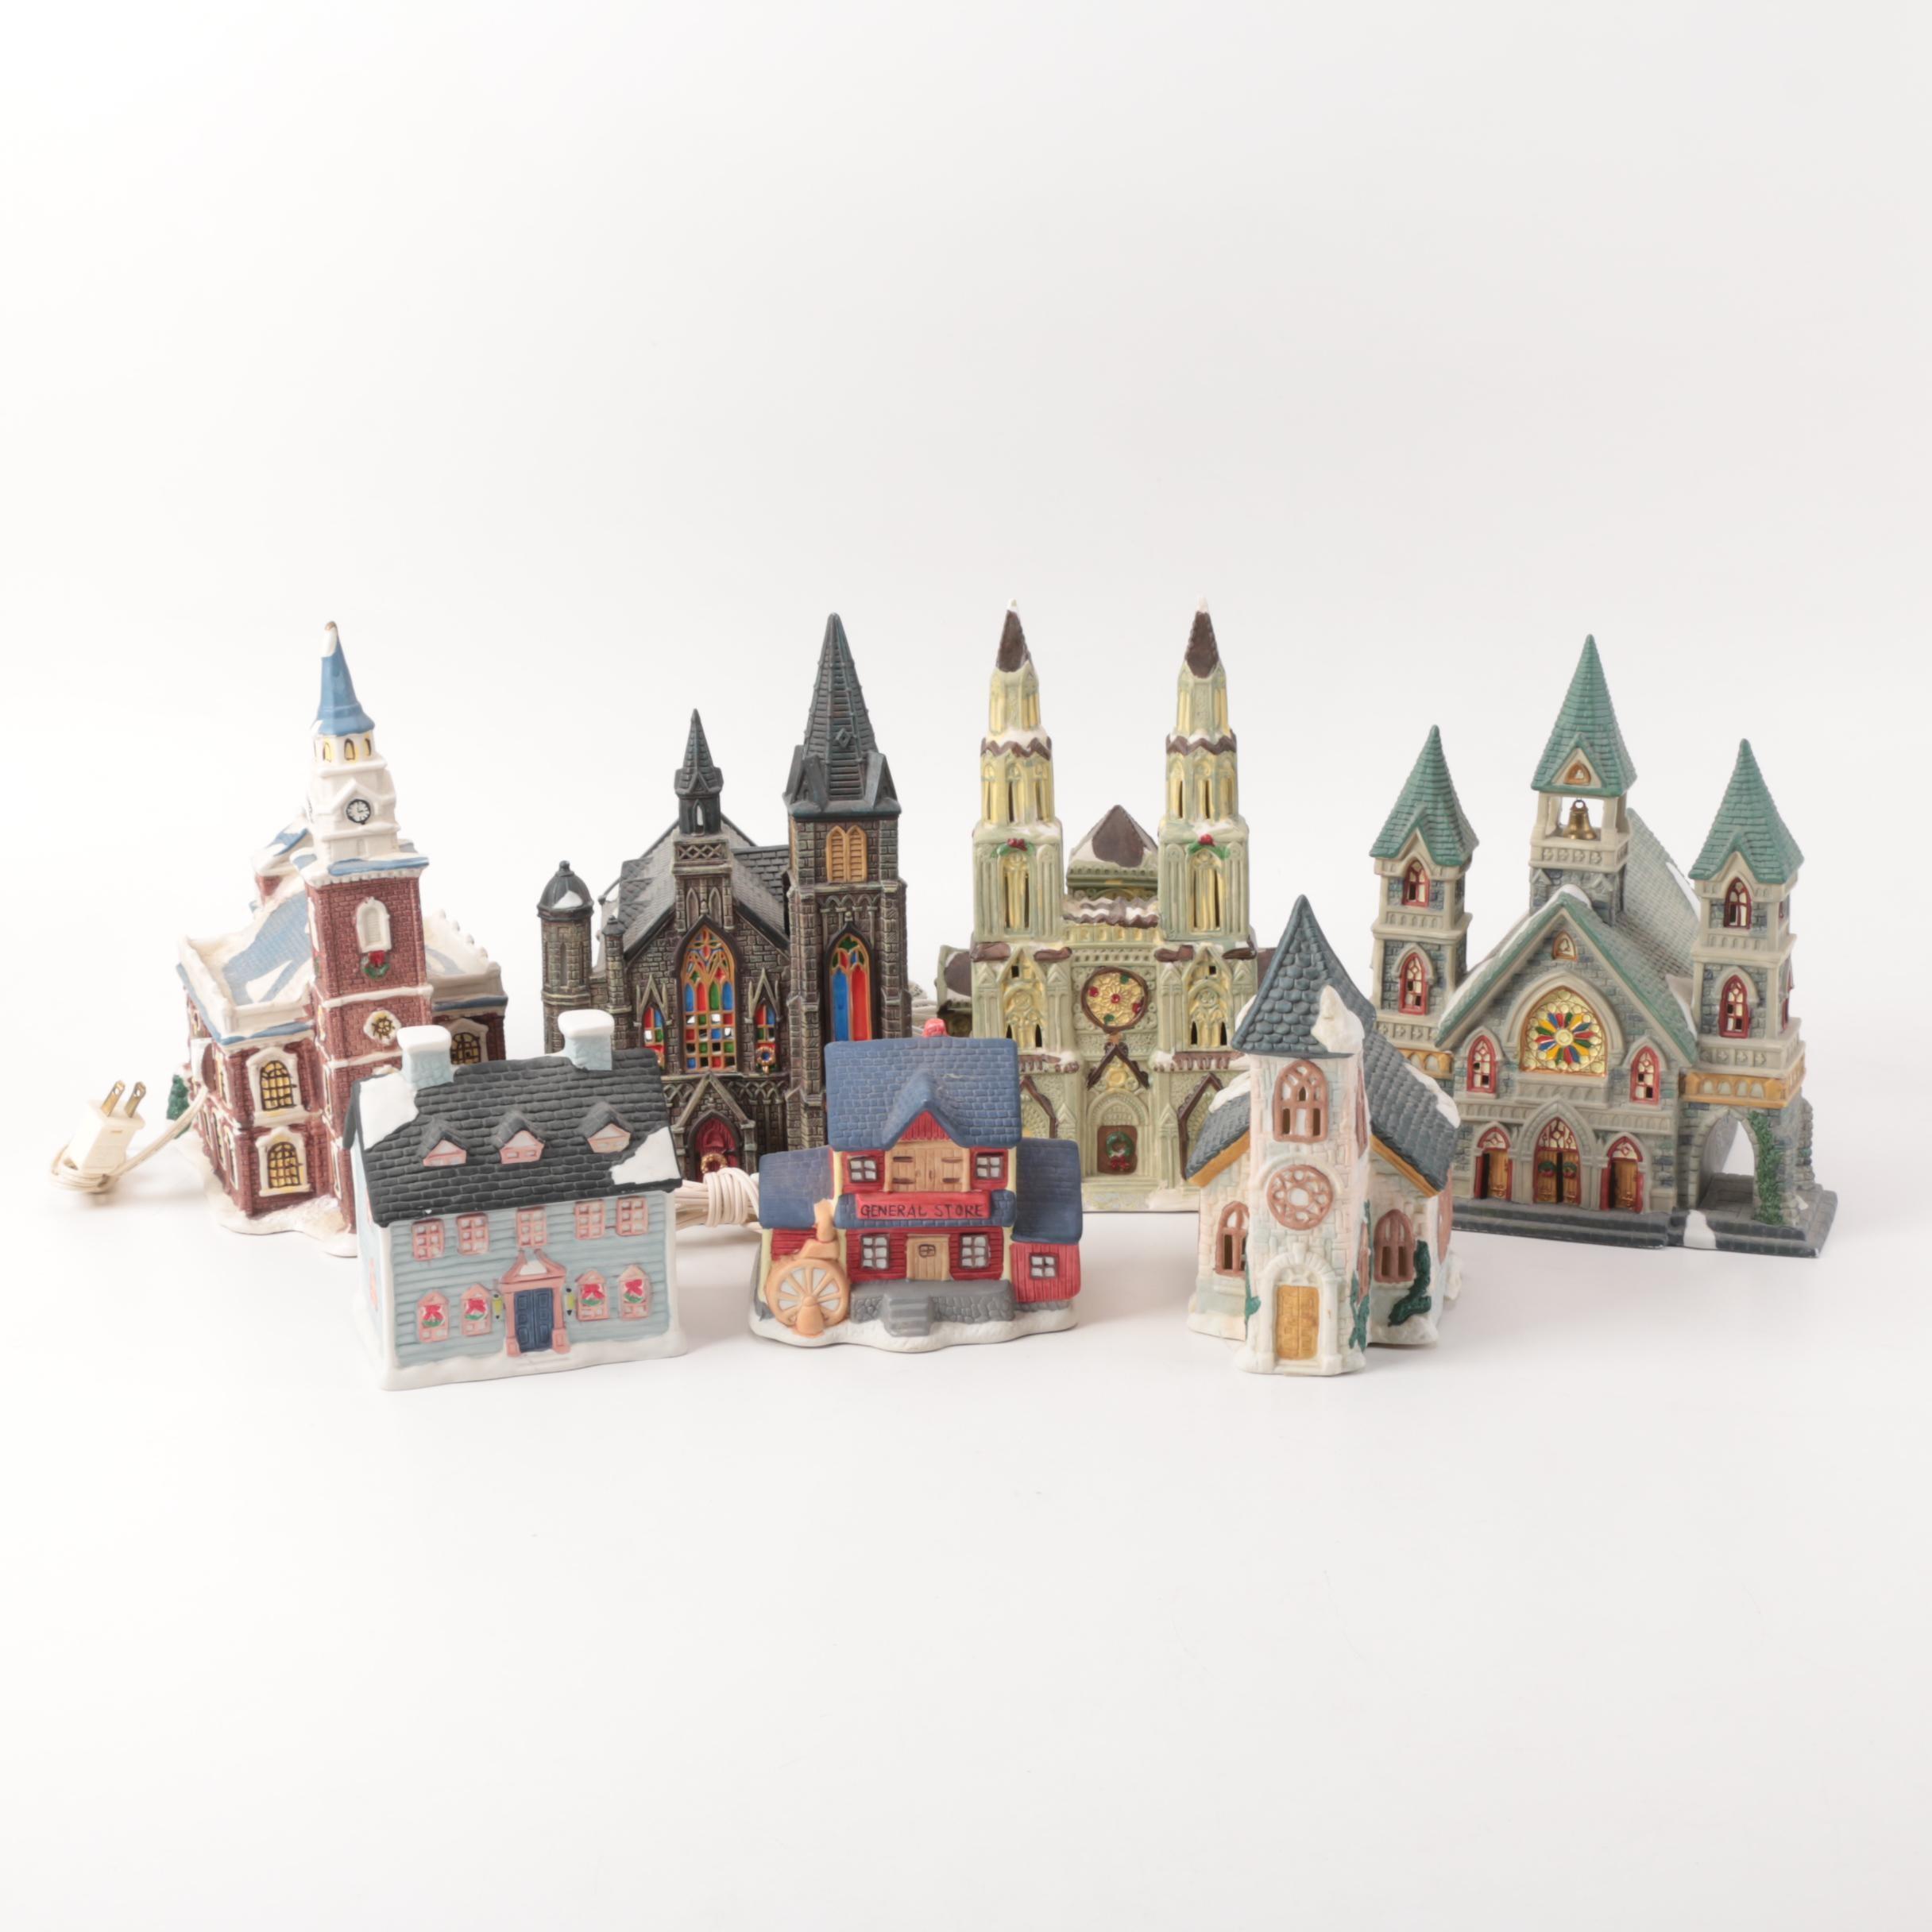 Lighted Christmas Ceramic Figurines